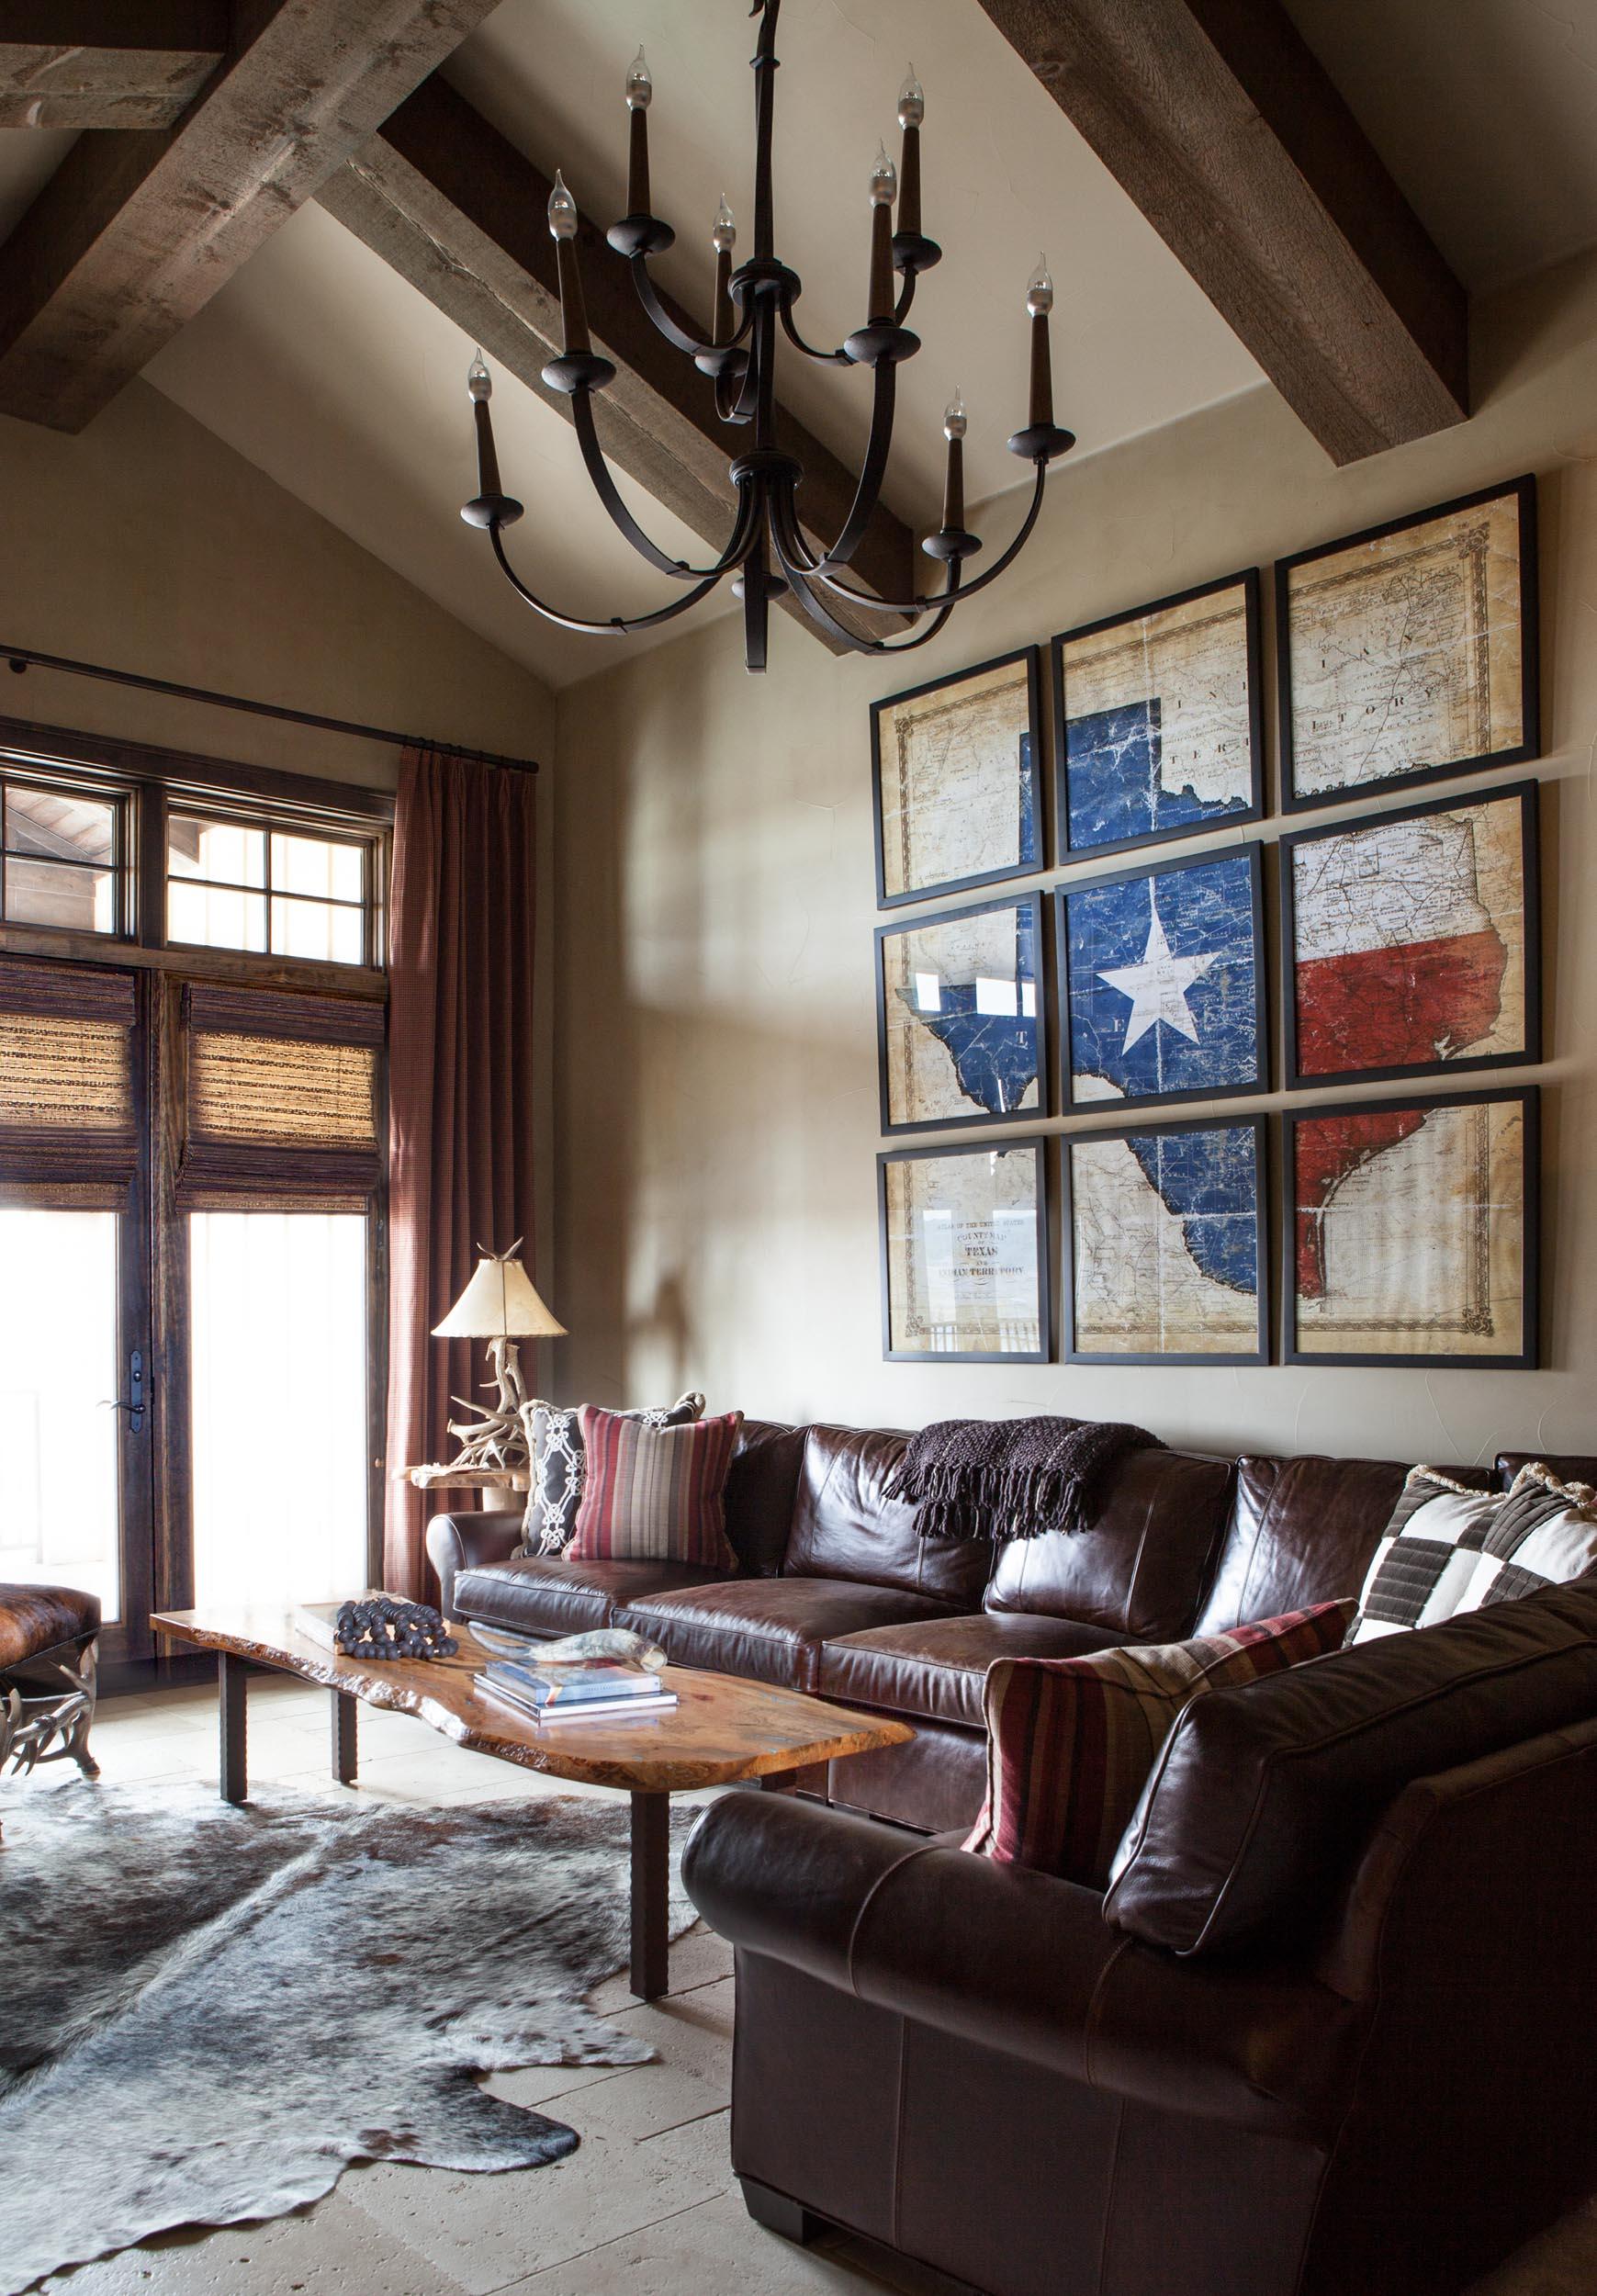 austin-house-living-room-sofa-interior-design.jpg